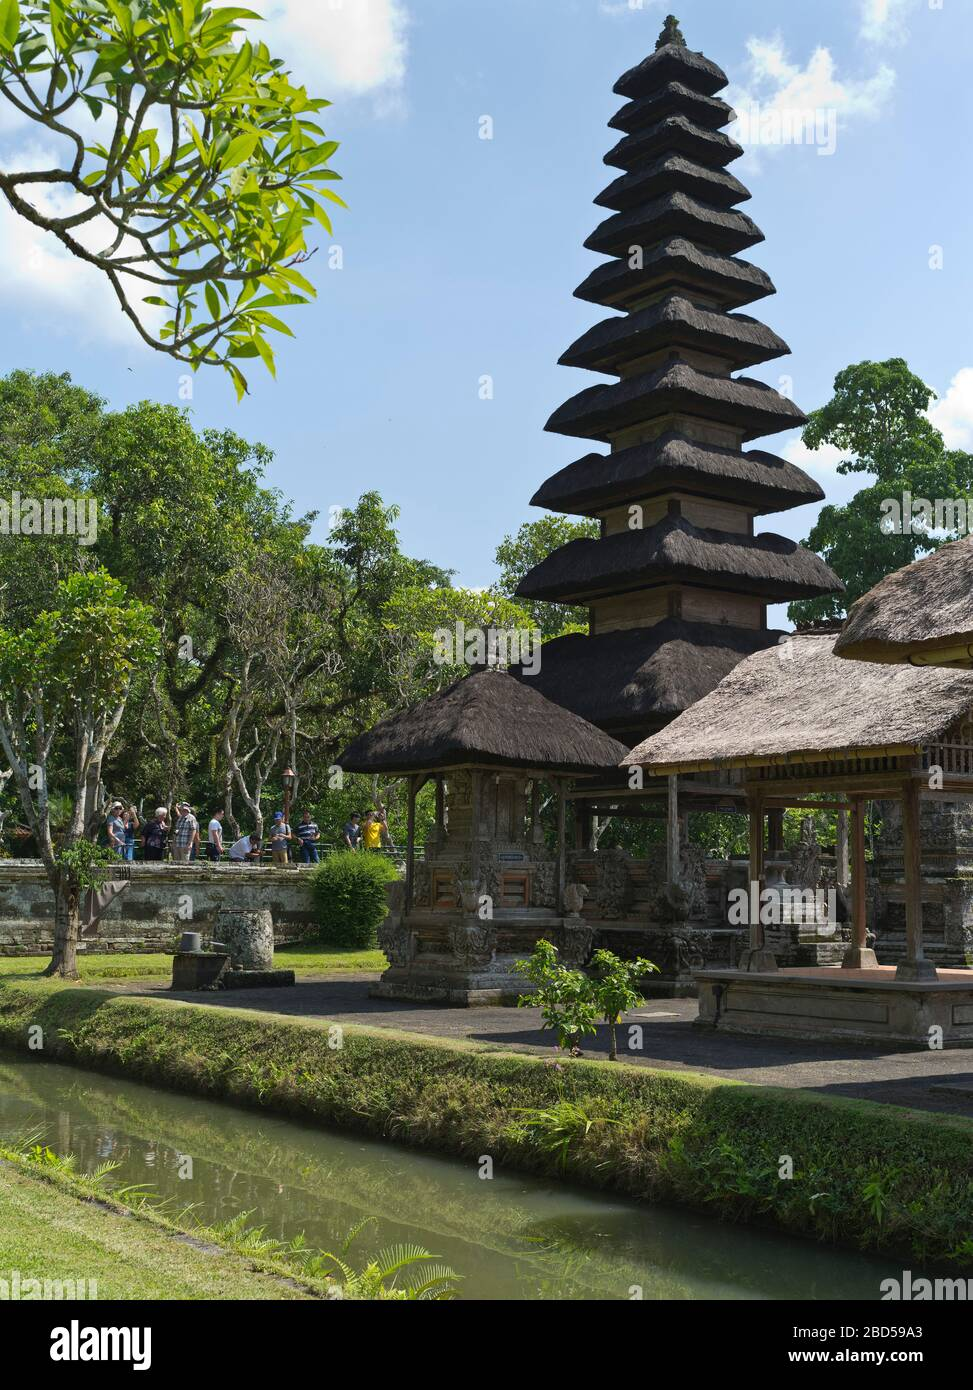 dh Pura Taman Ayun Royal Temple BALI INDONESIA Balinese Hindu Mengwi temples inner sanctum pelinggih meru tower shrine towers shrines turret Stock Photo